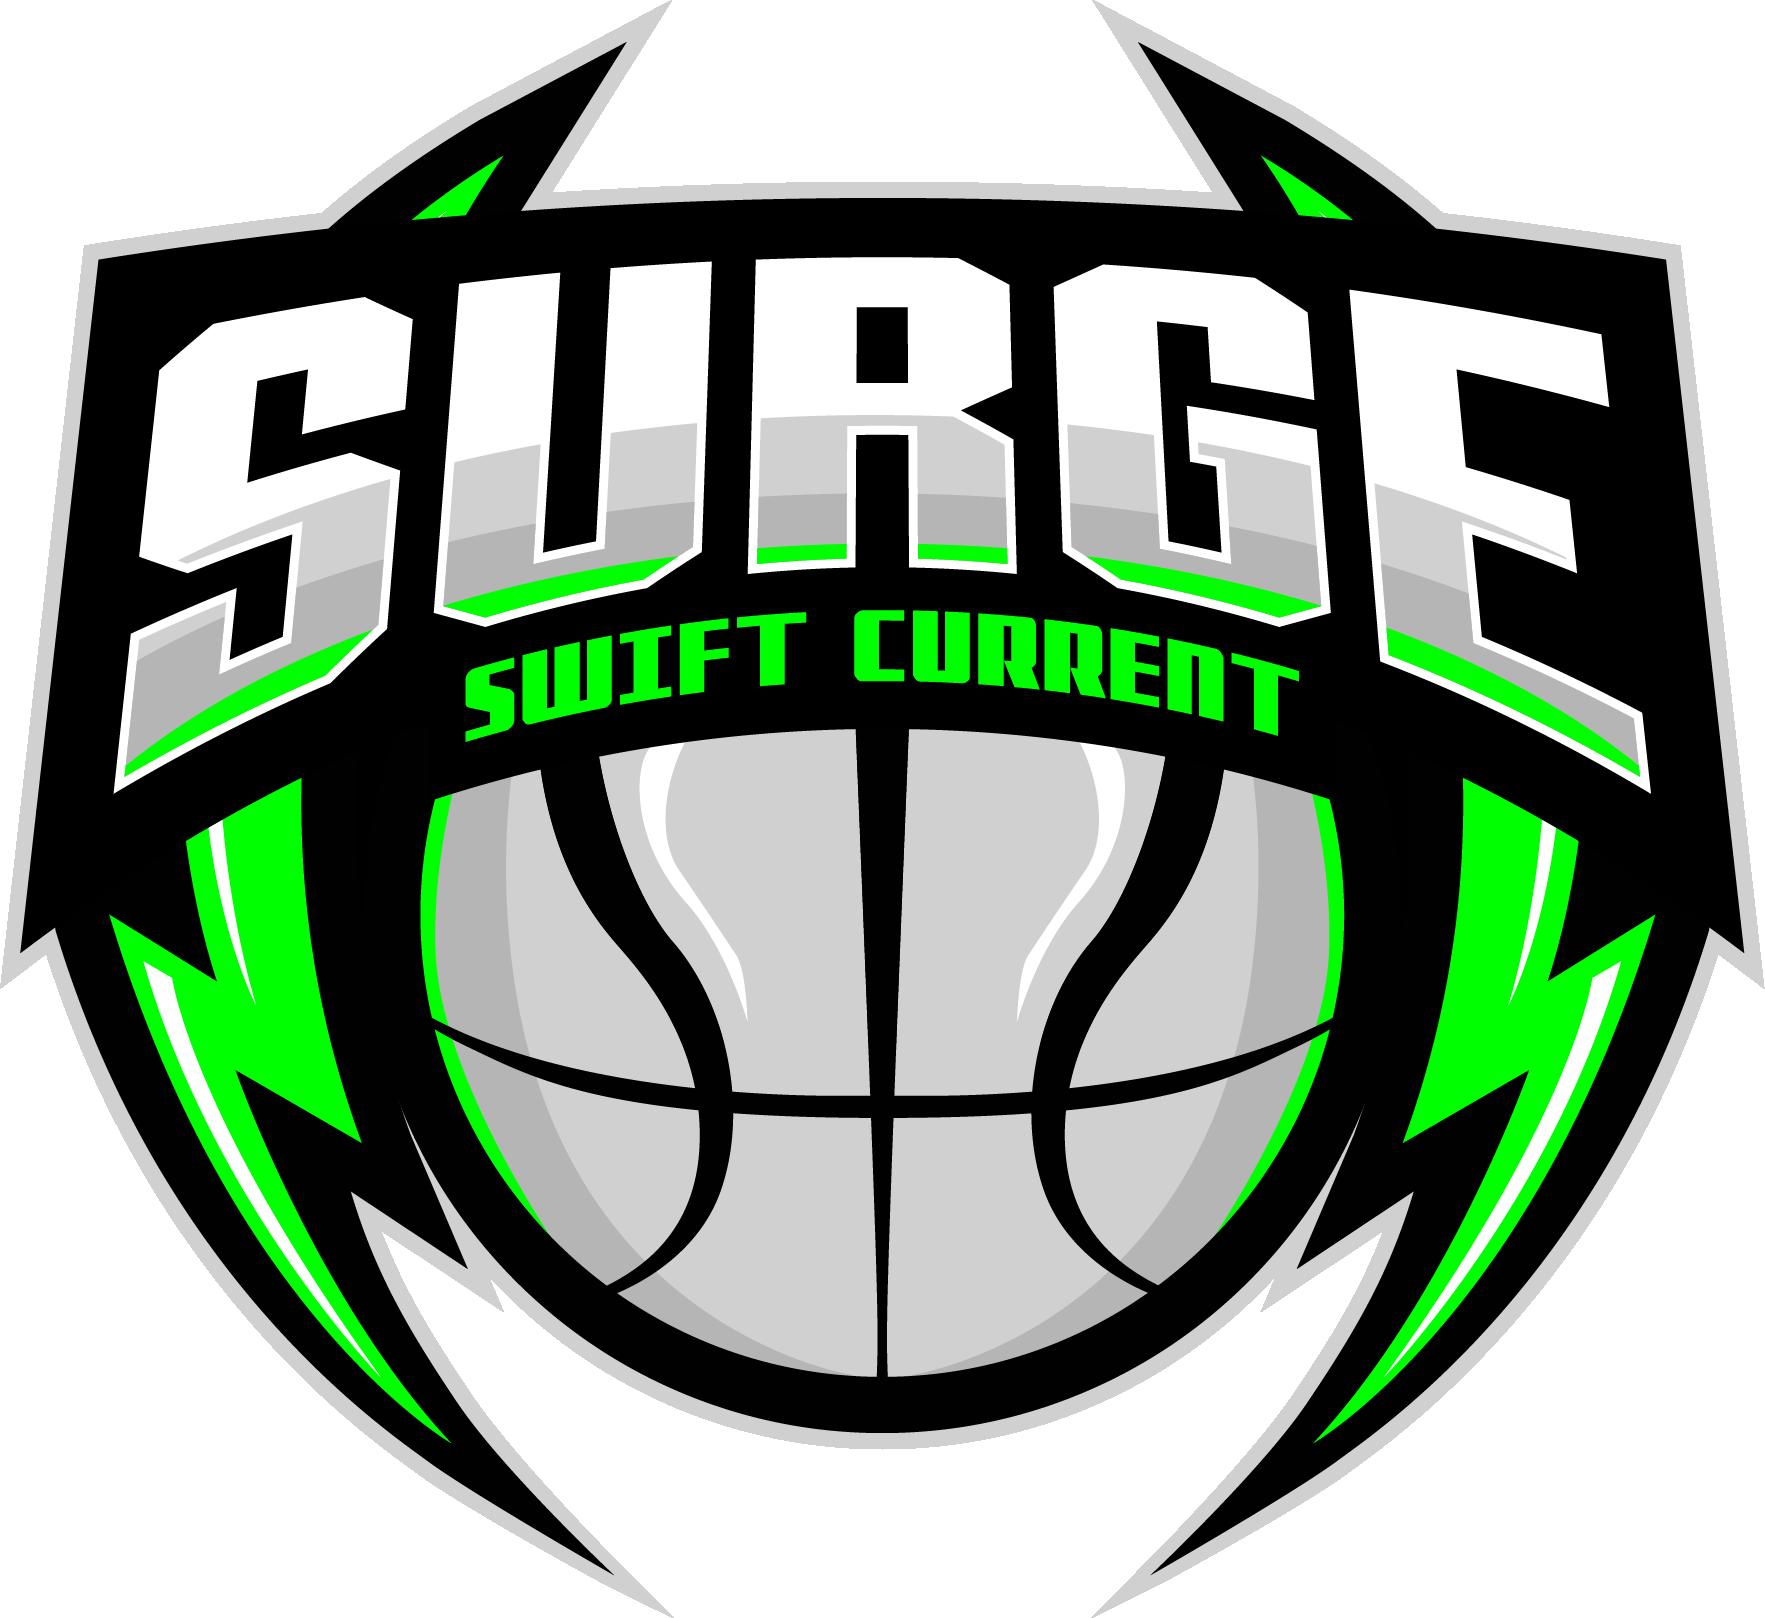 Basketball emblem clipart svg freeuse library Summer Camp svg freeuse library